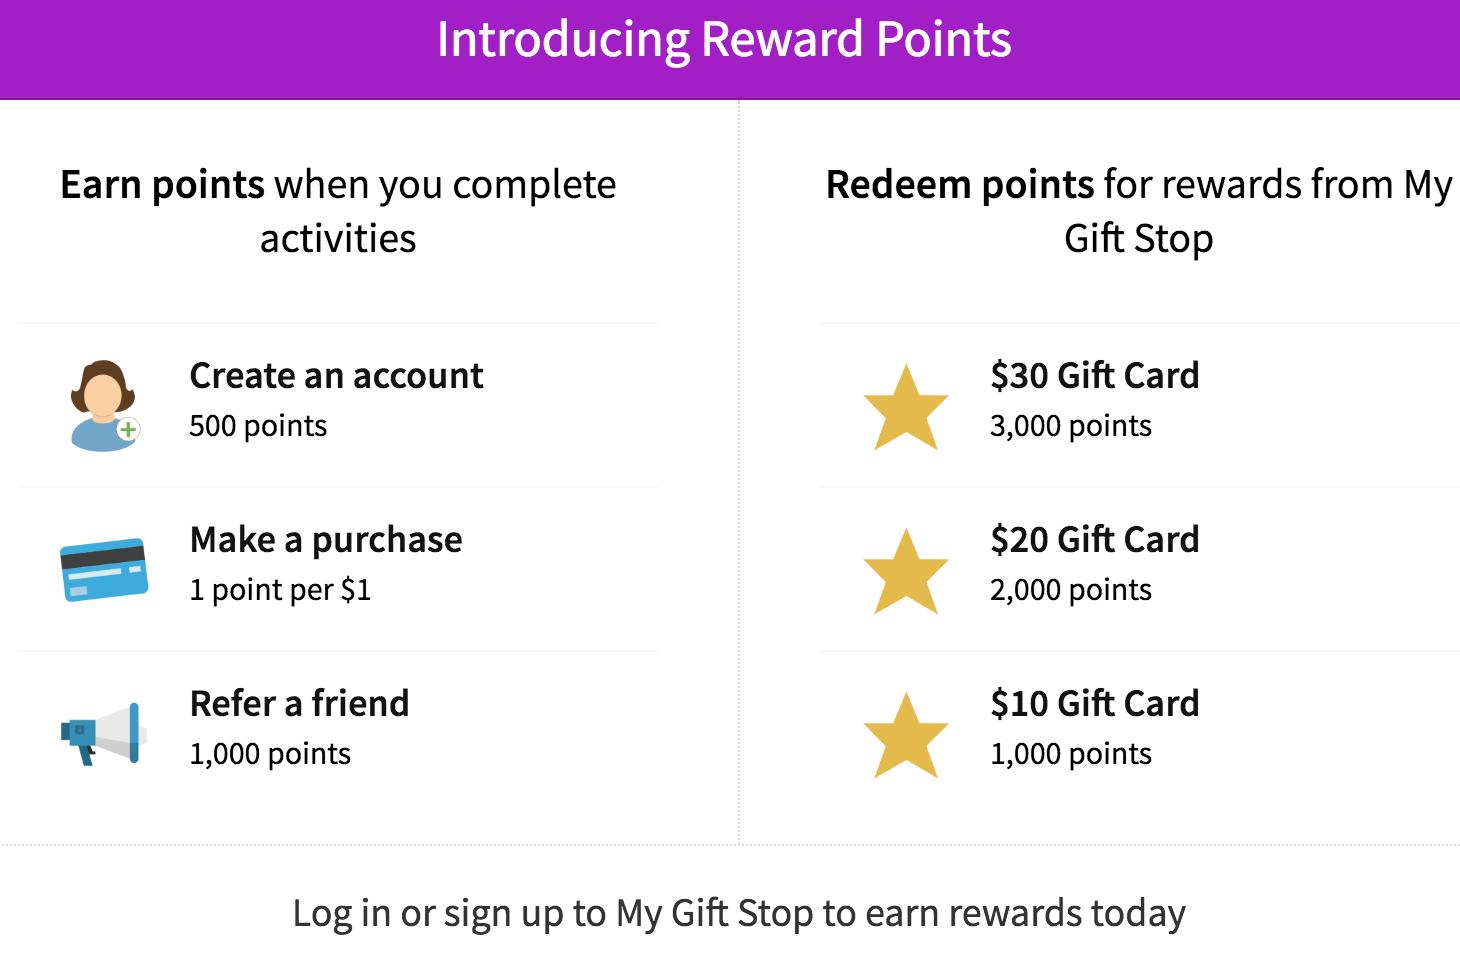 My Gift Stop Rewards Program